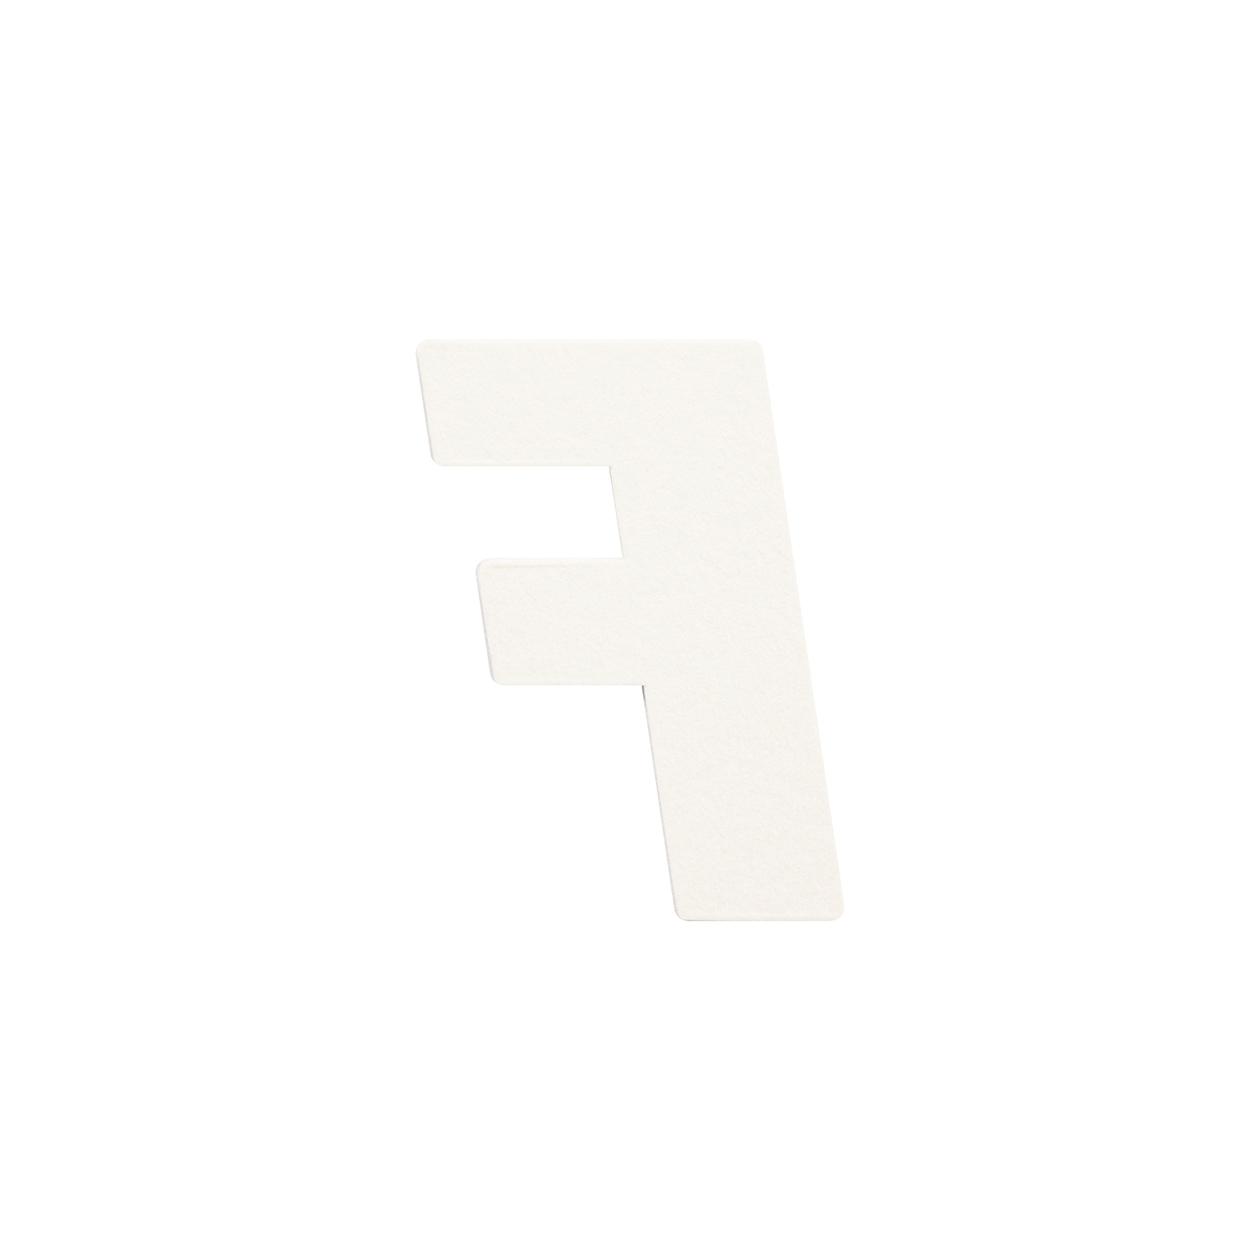 No.395ボード A7カードDC 文字F シルバー